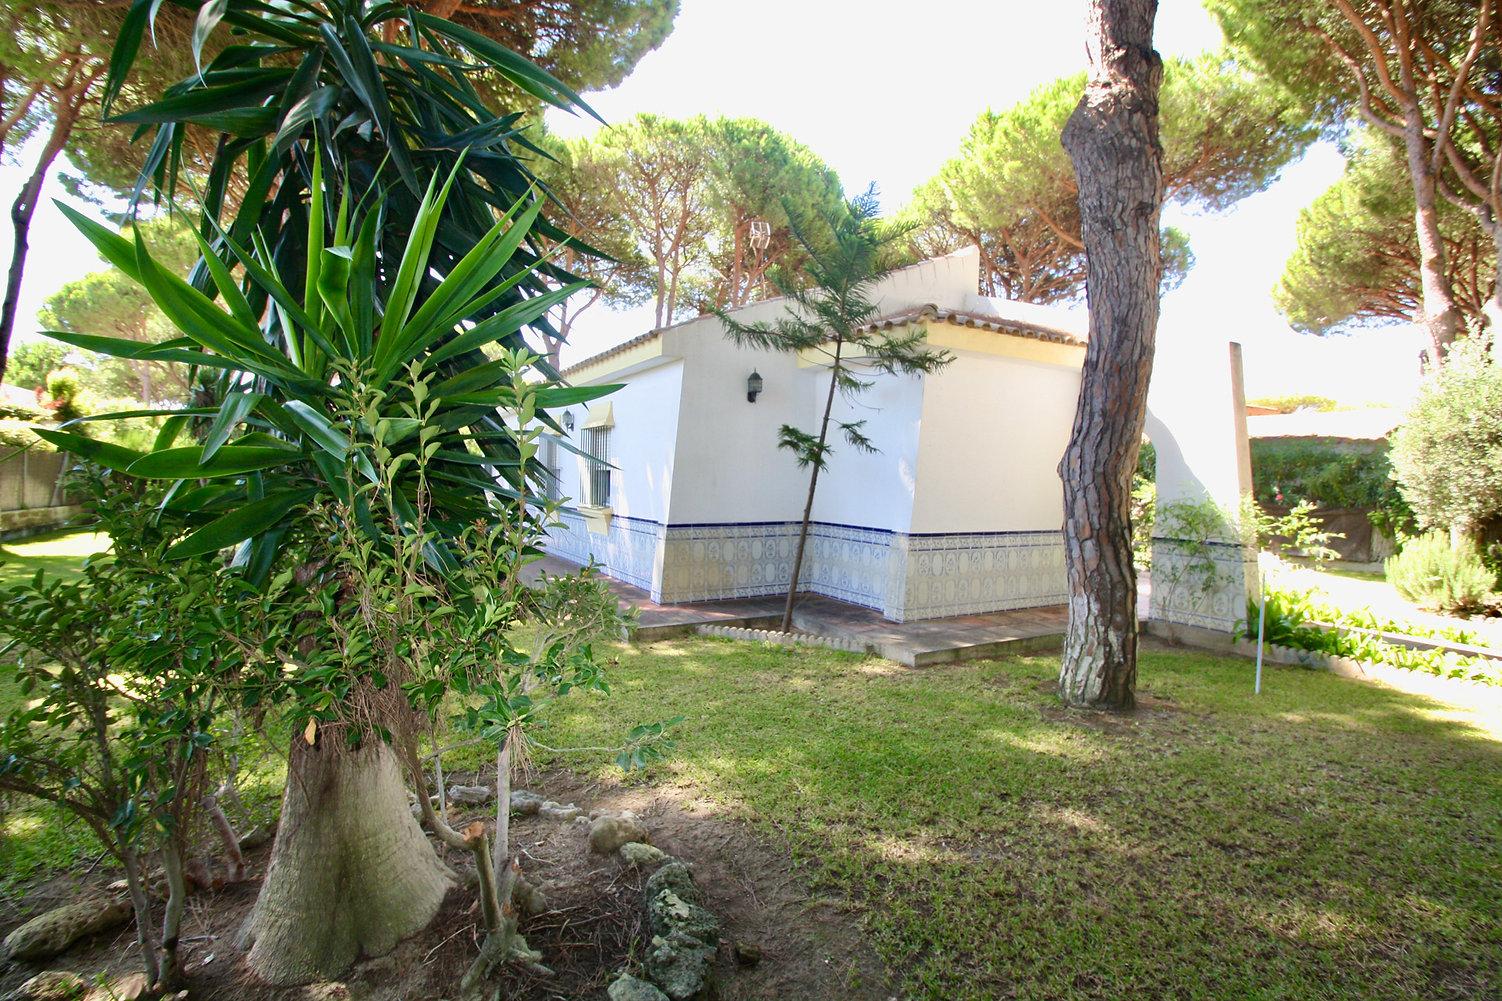 plants-pine-trees-property-plot-refv79.J